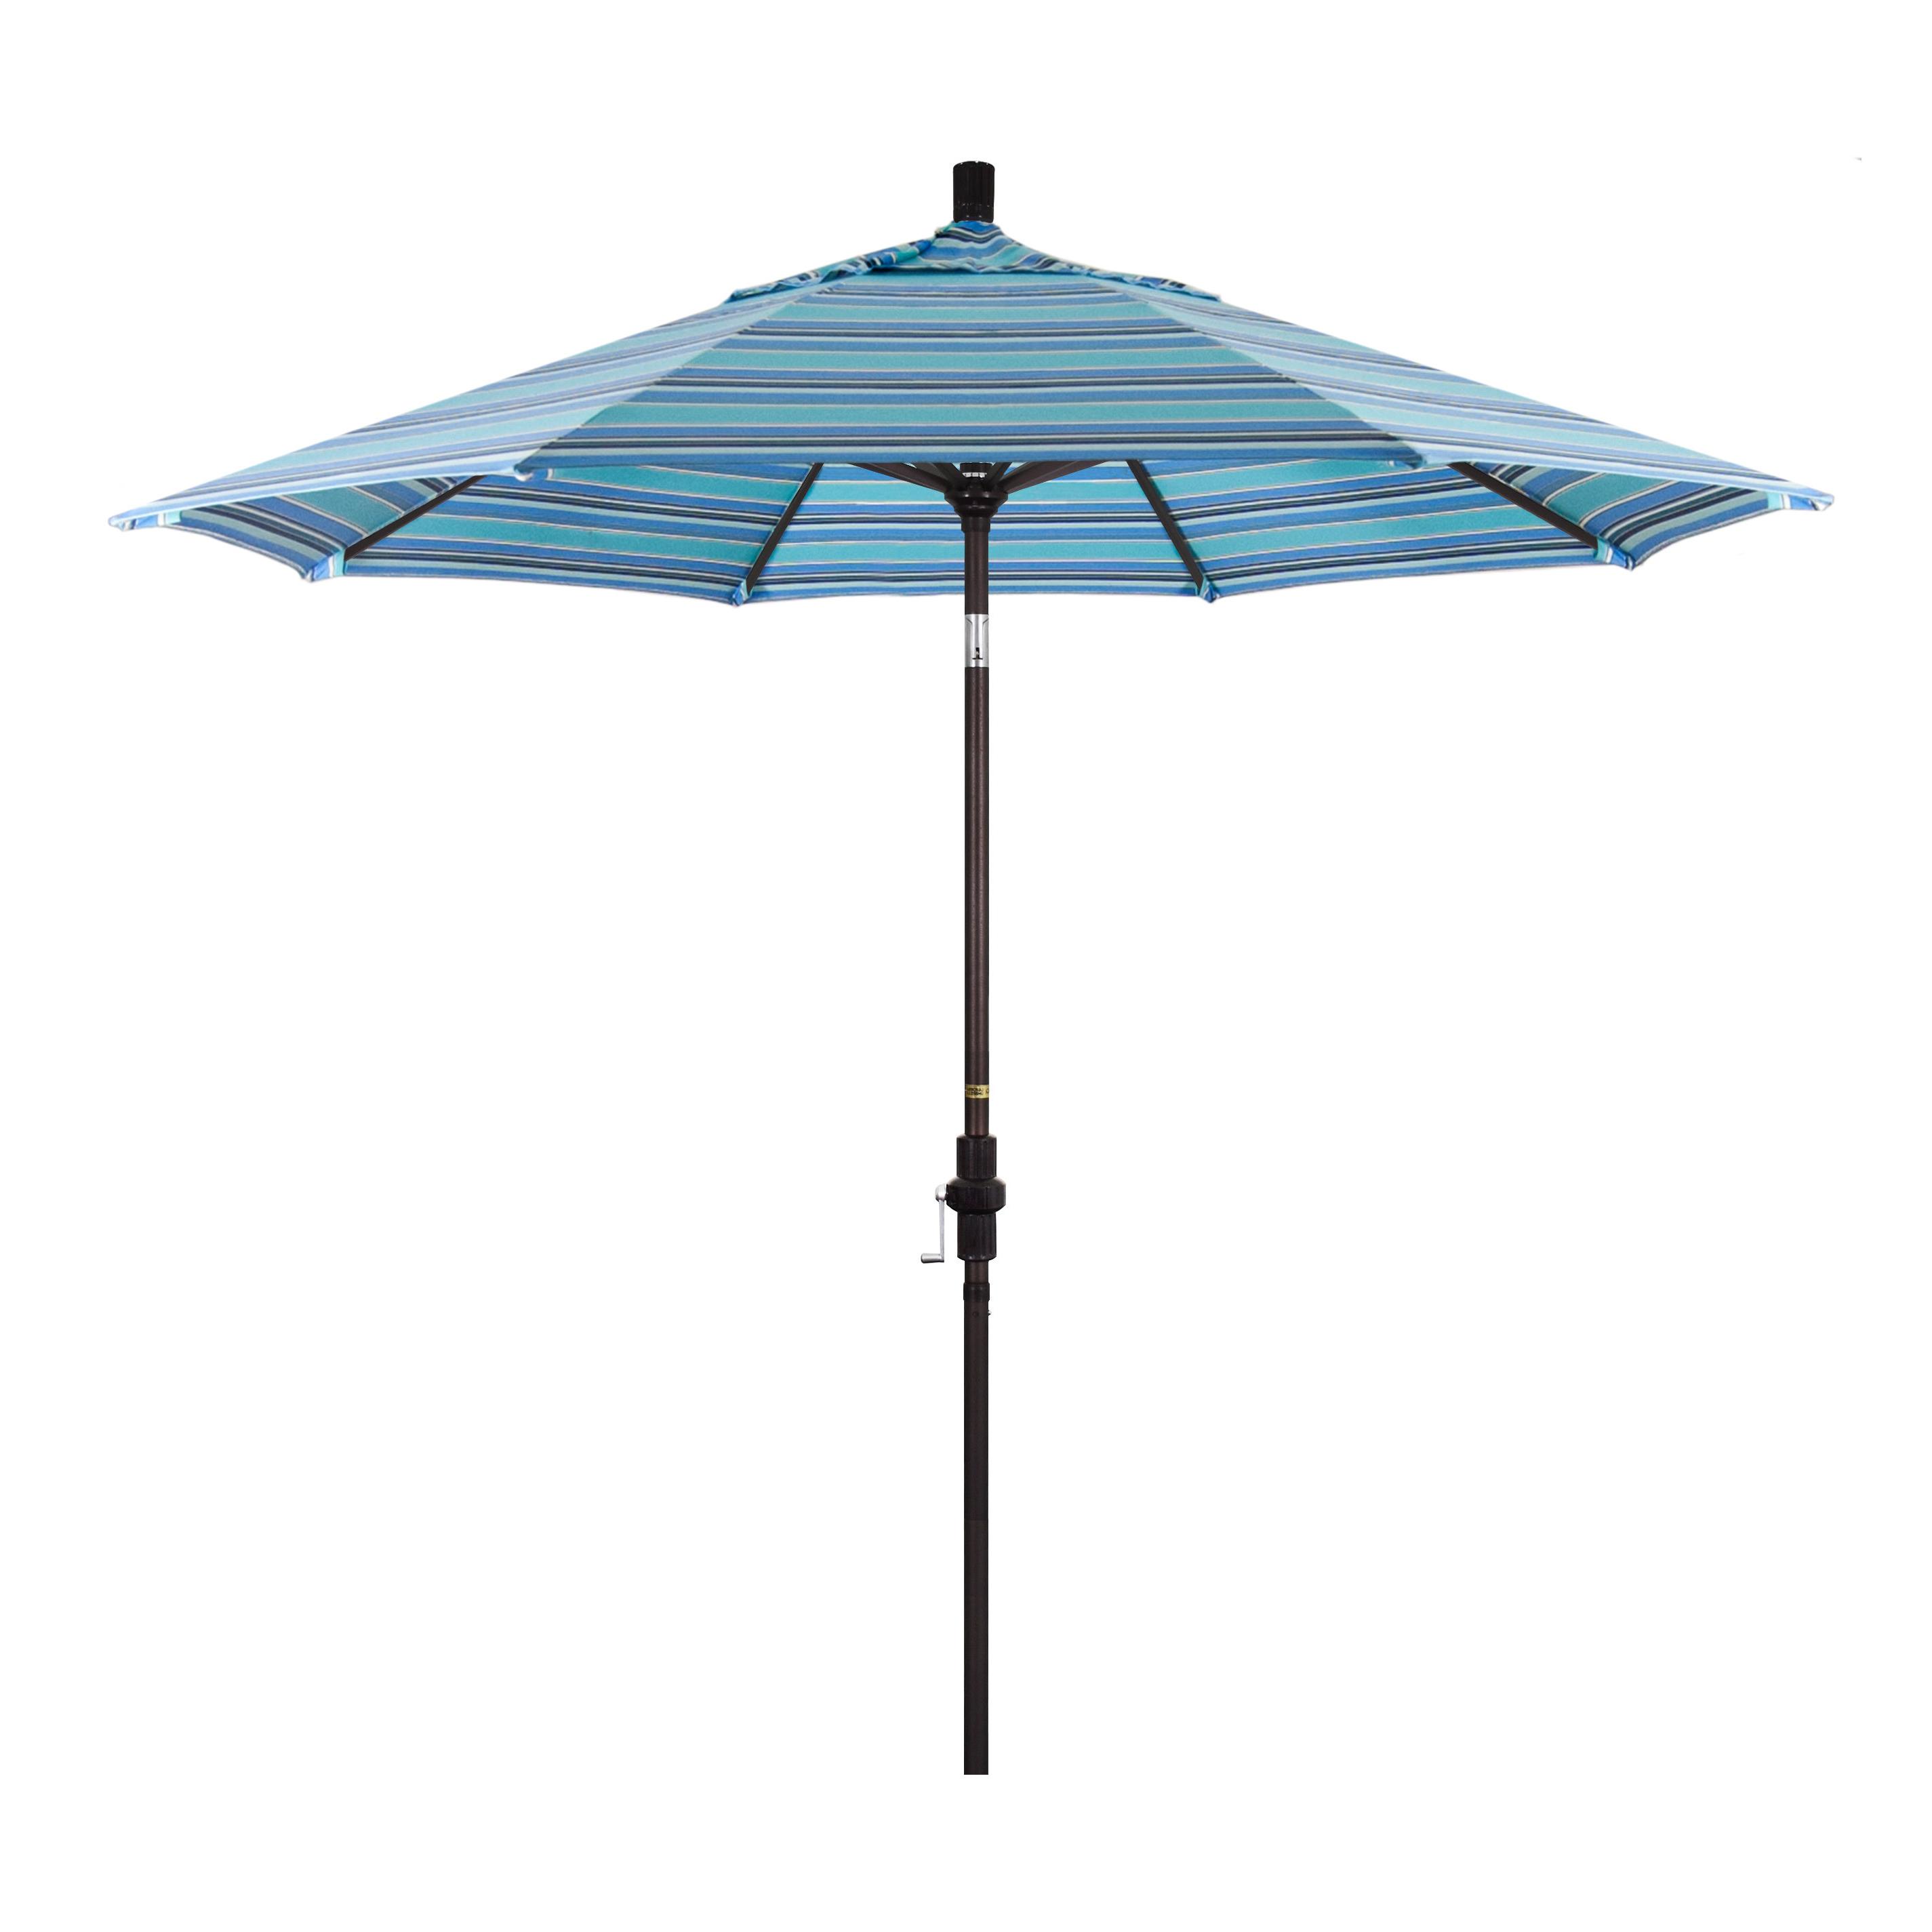 Newest Golden State Series 9' Market Sunbrella Umbrella For Caravelle Market Sunbrella Umbrellas (View 19 of 20)